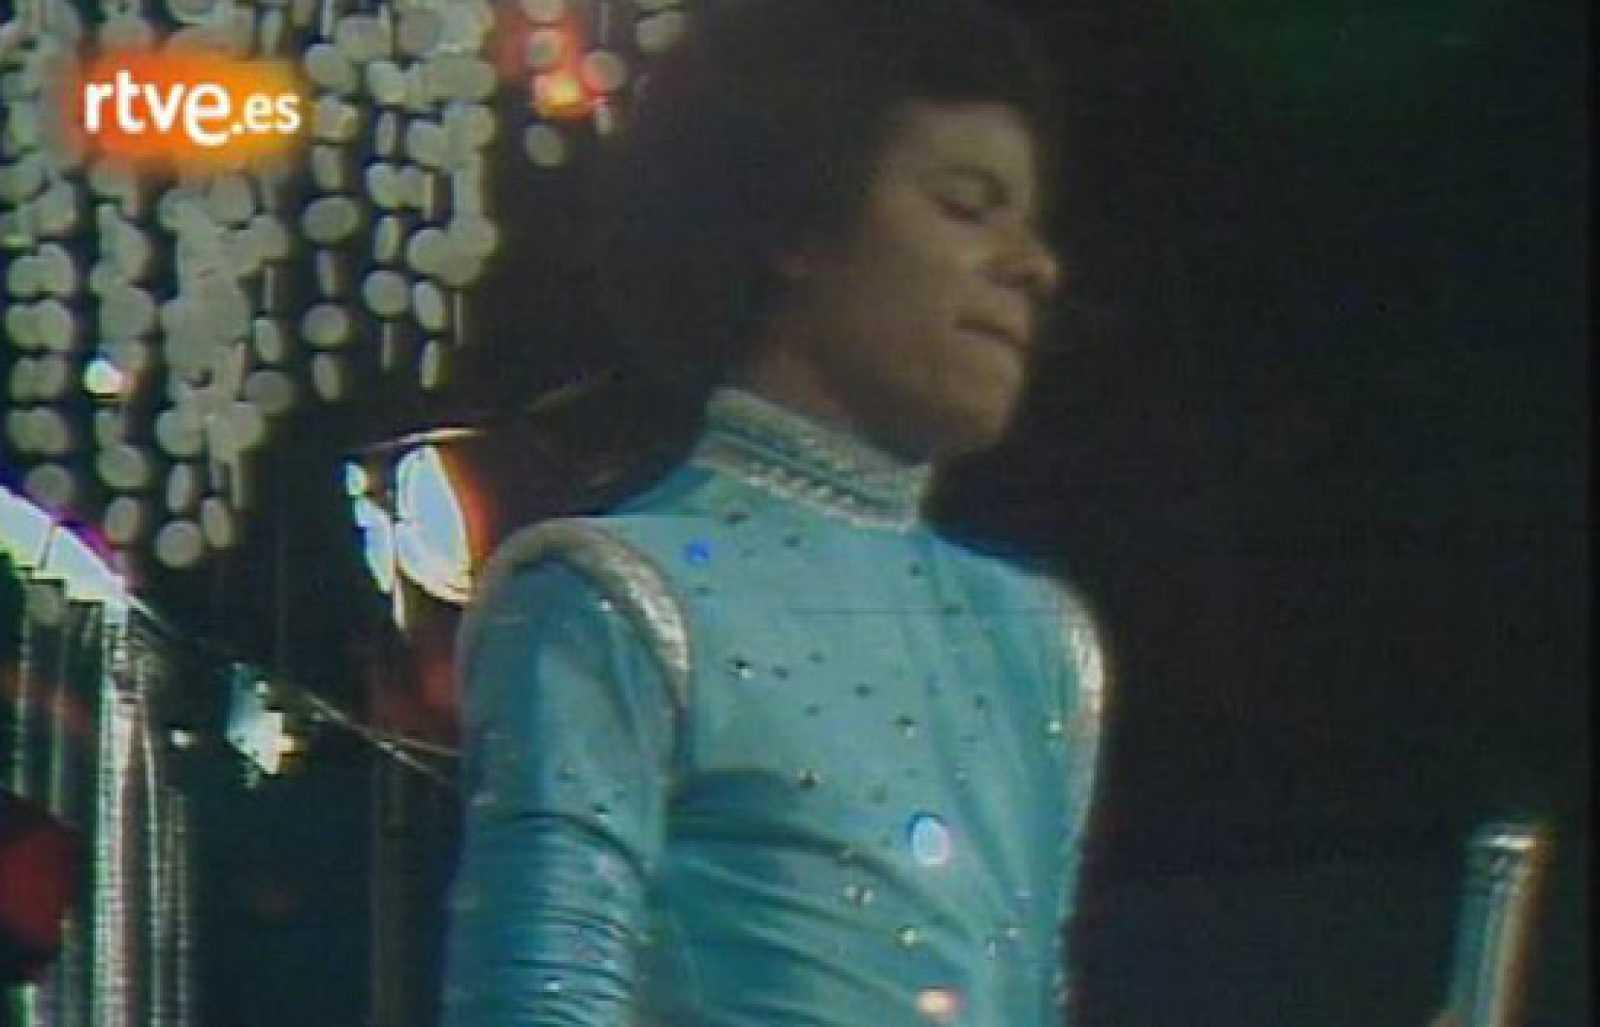 Aplauso - The Jackson Five